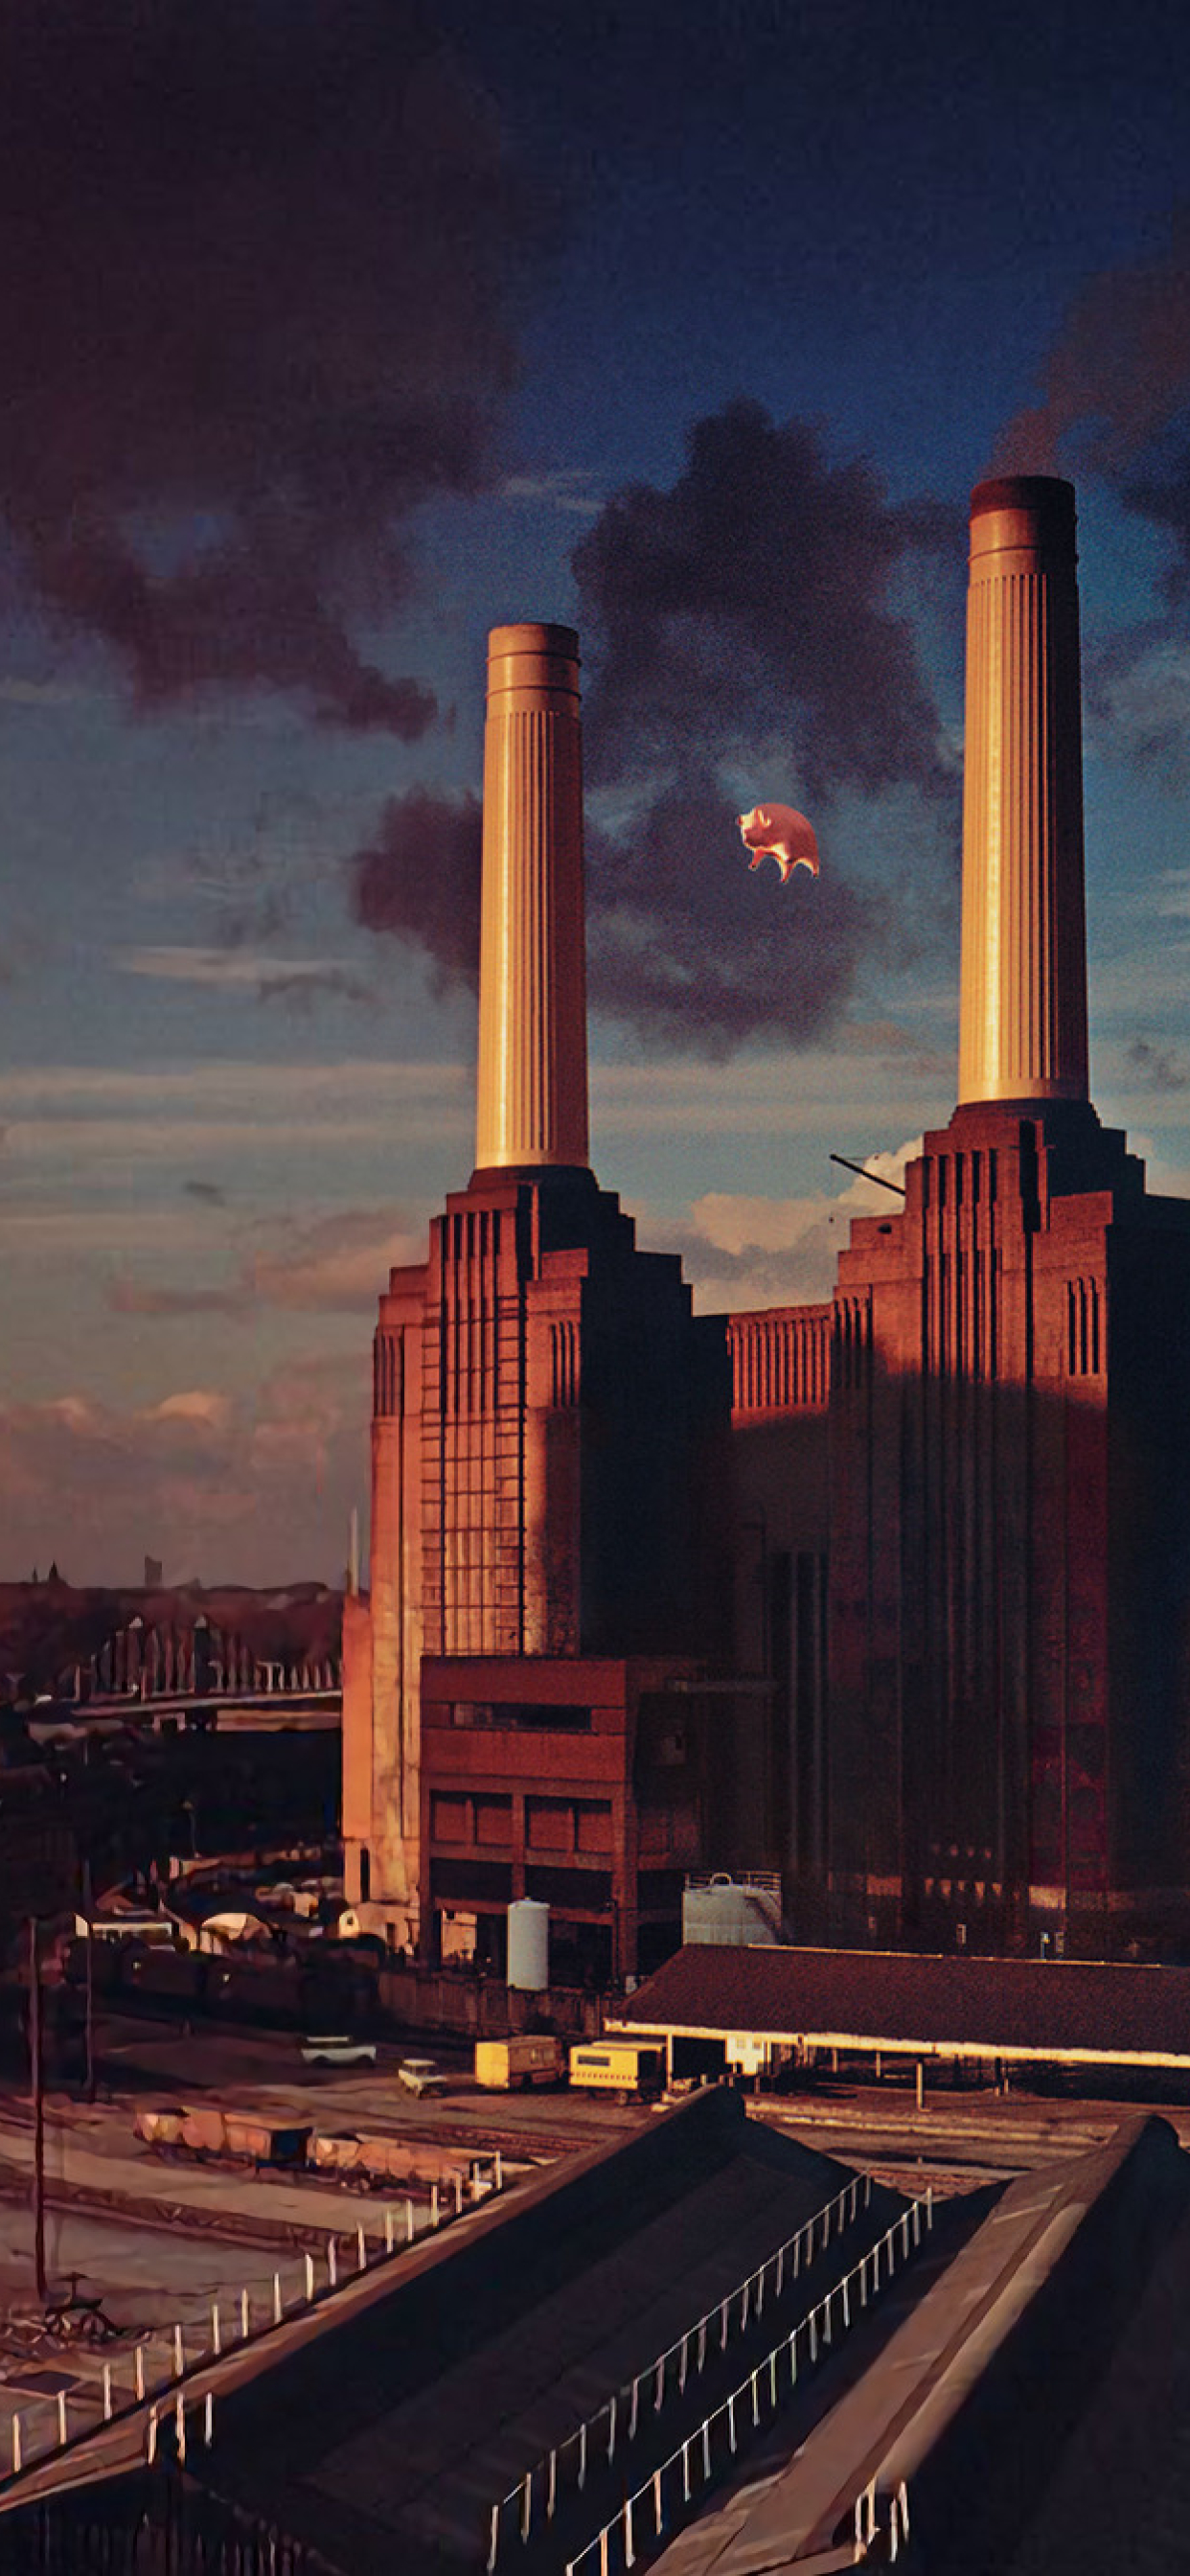 1242x2688 Pink Floyd Animals Album Cover Iphone Xs Max Wallpaper